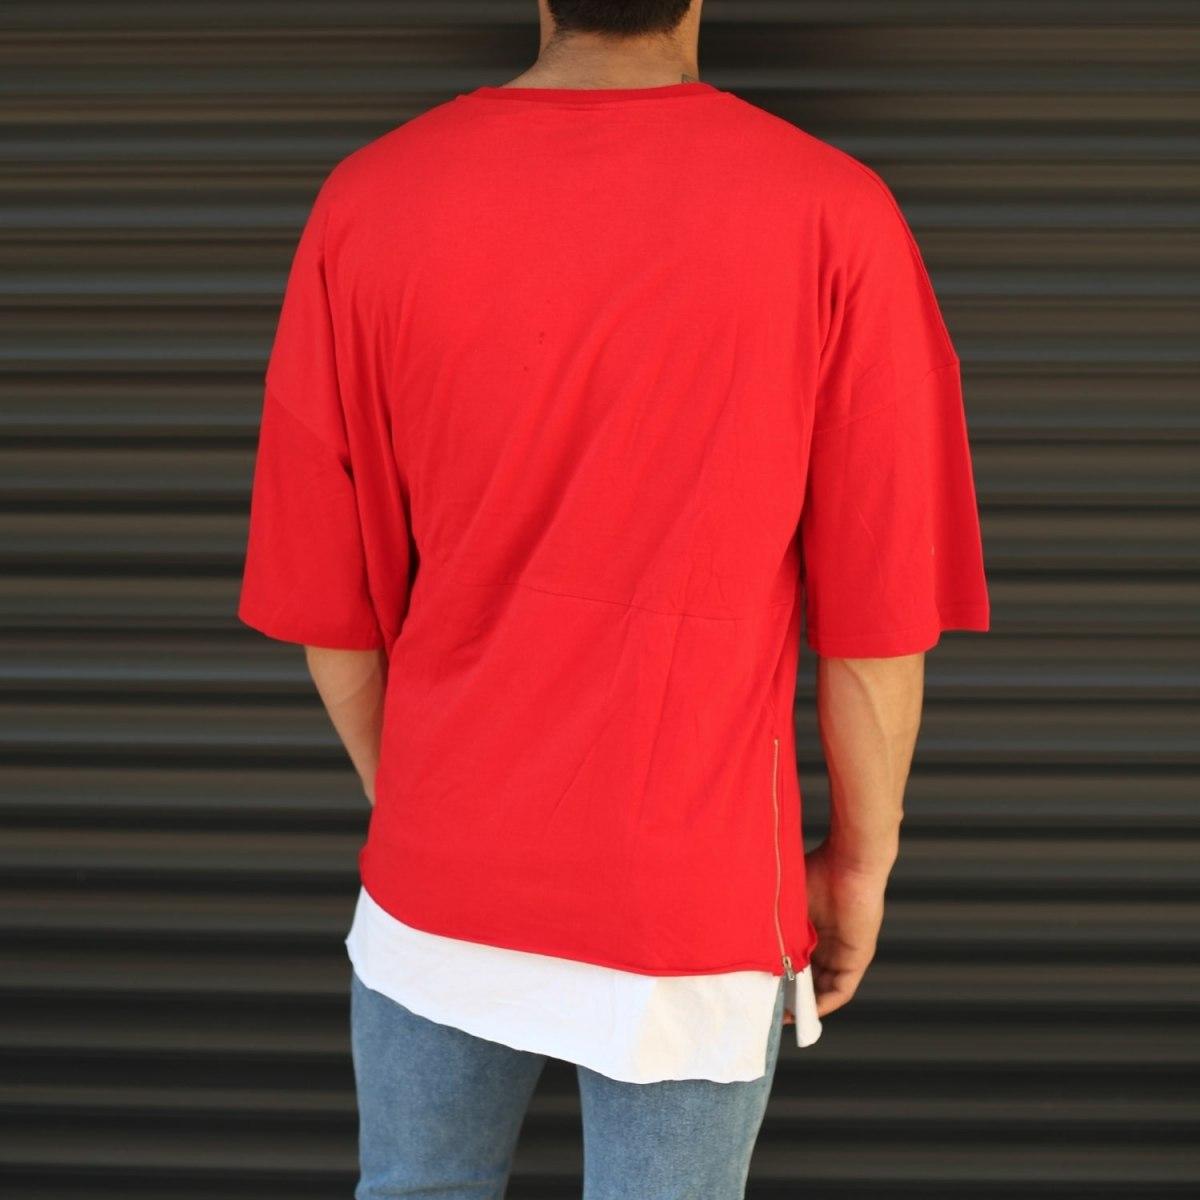 Men's Oversized Round Neck T-Shirt With Zipper Detail Red Mv Premium Brand - 4